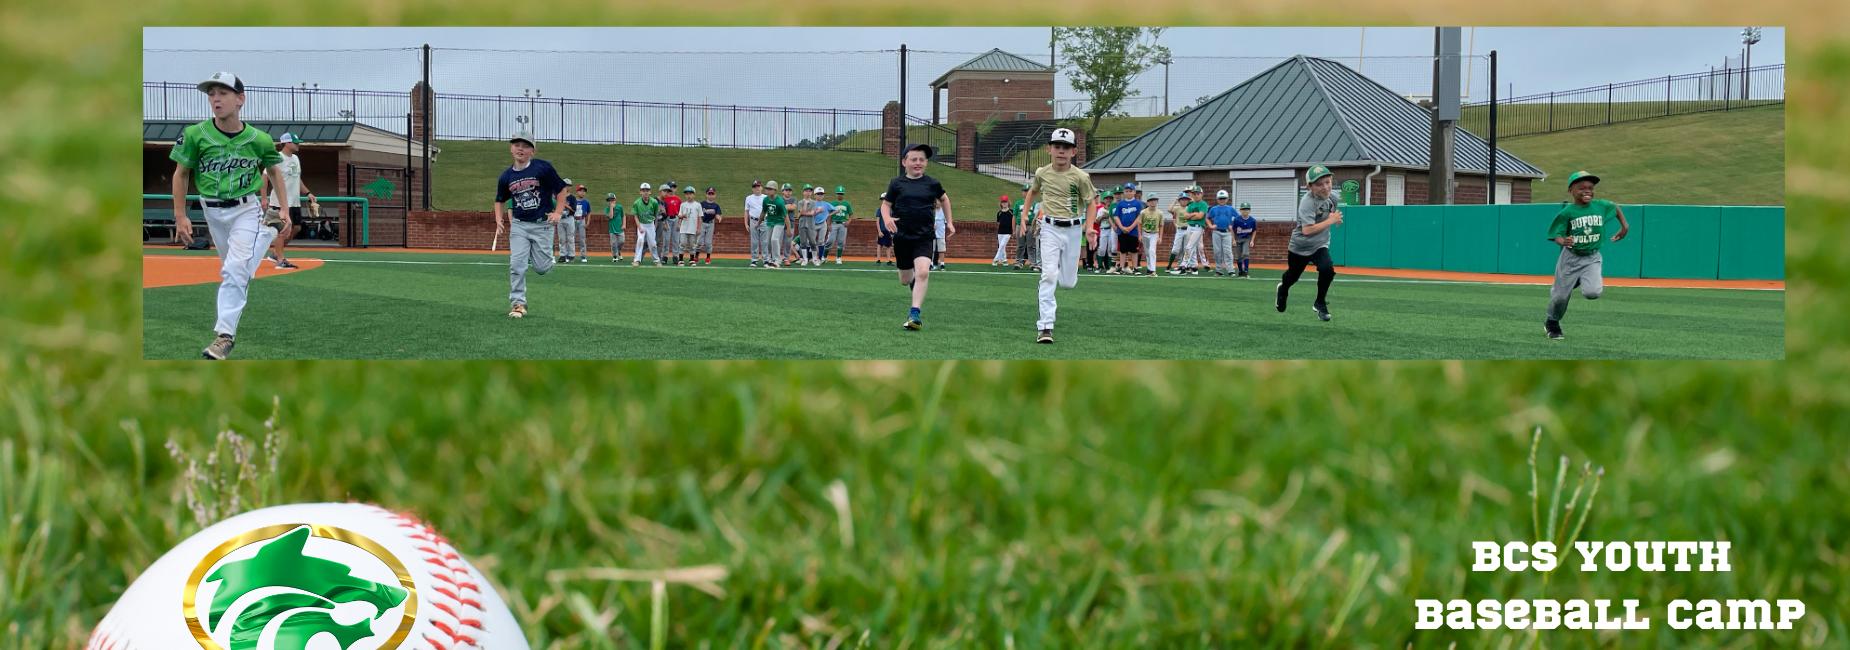 Base Ball Camp Slider Image